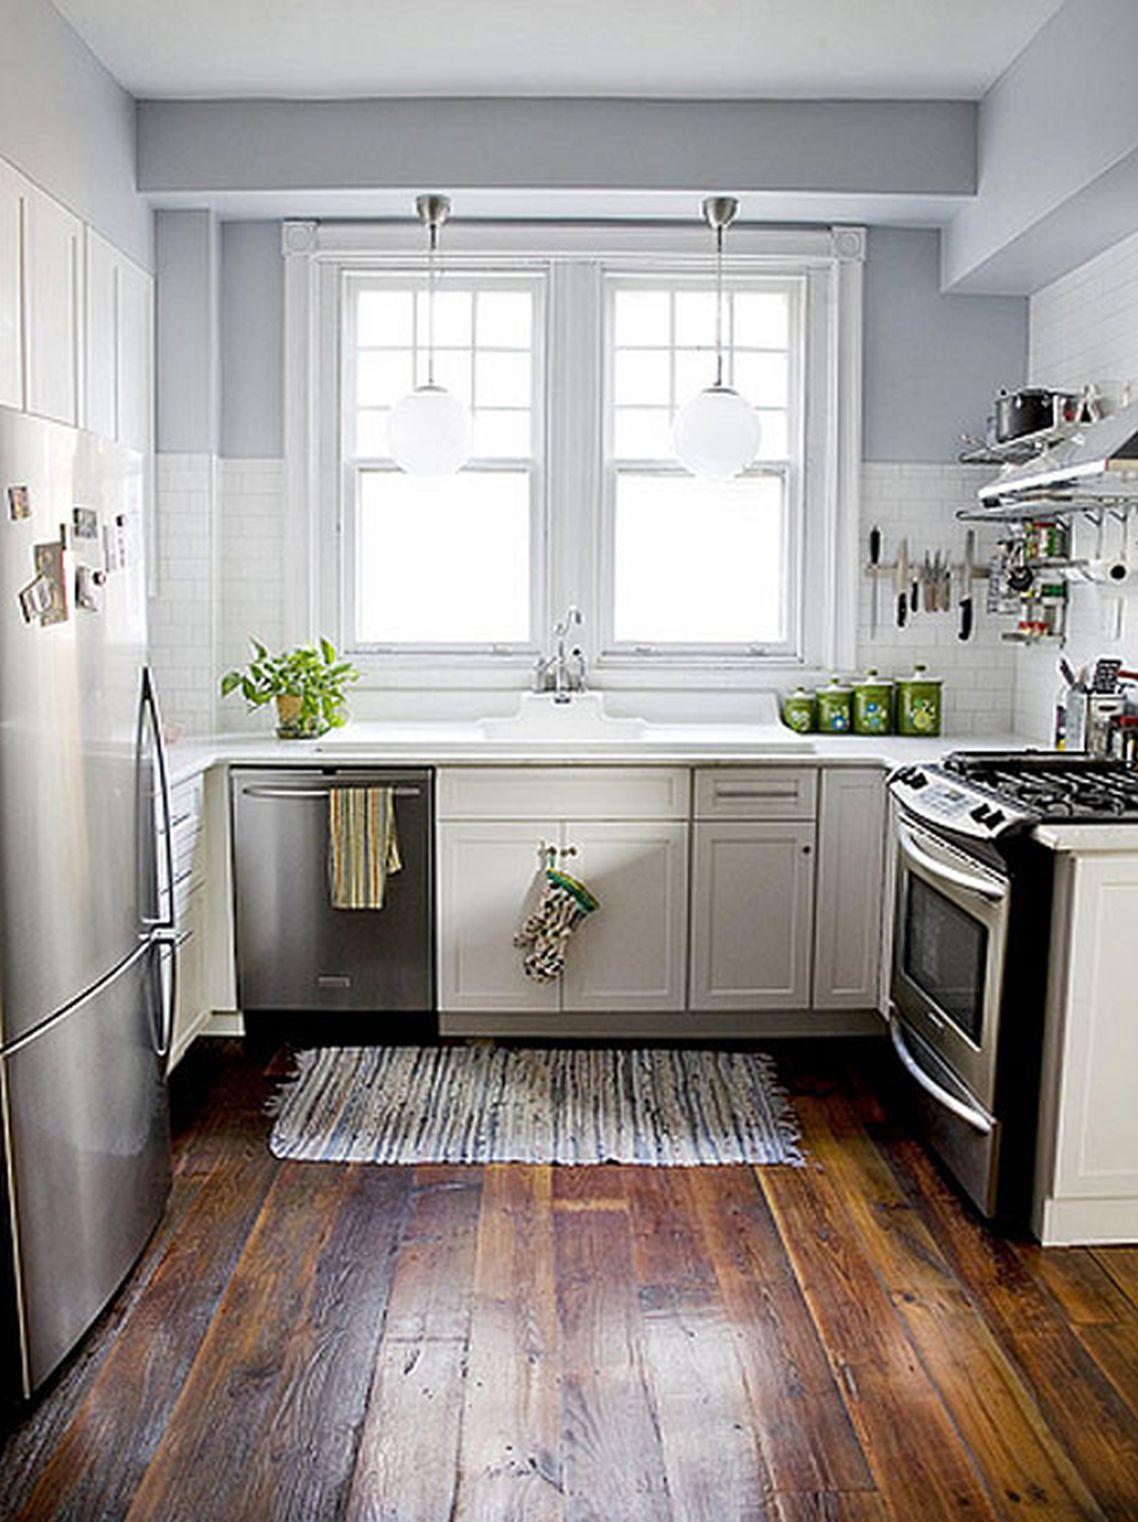 Wonderful White Wood Glass Stainless Modern Design Kitchen Small